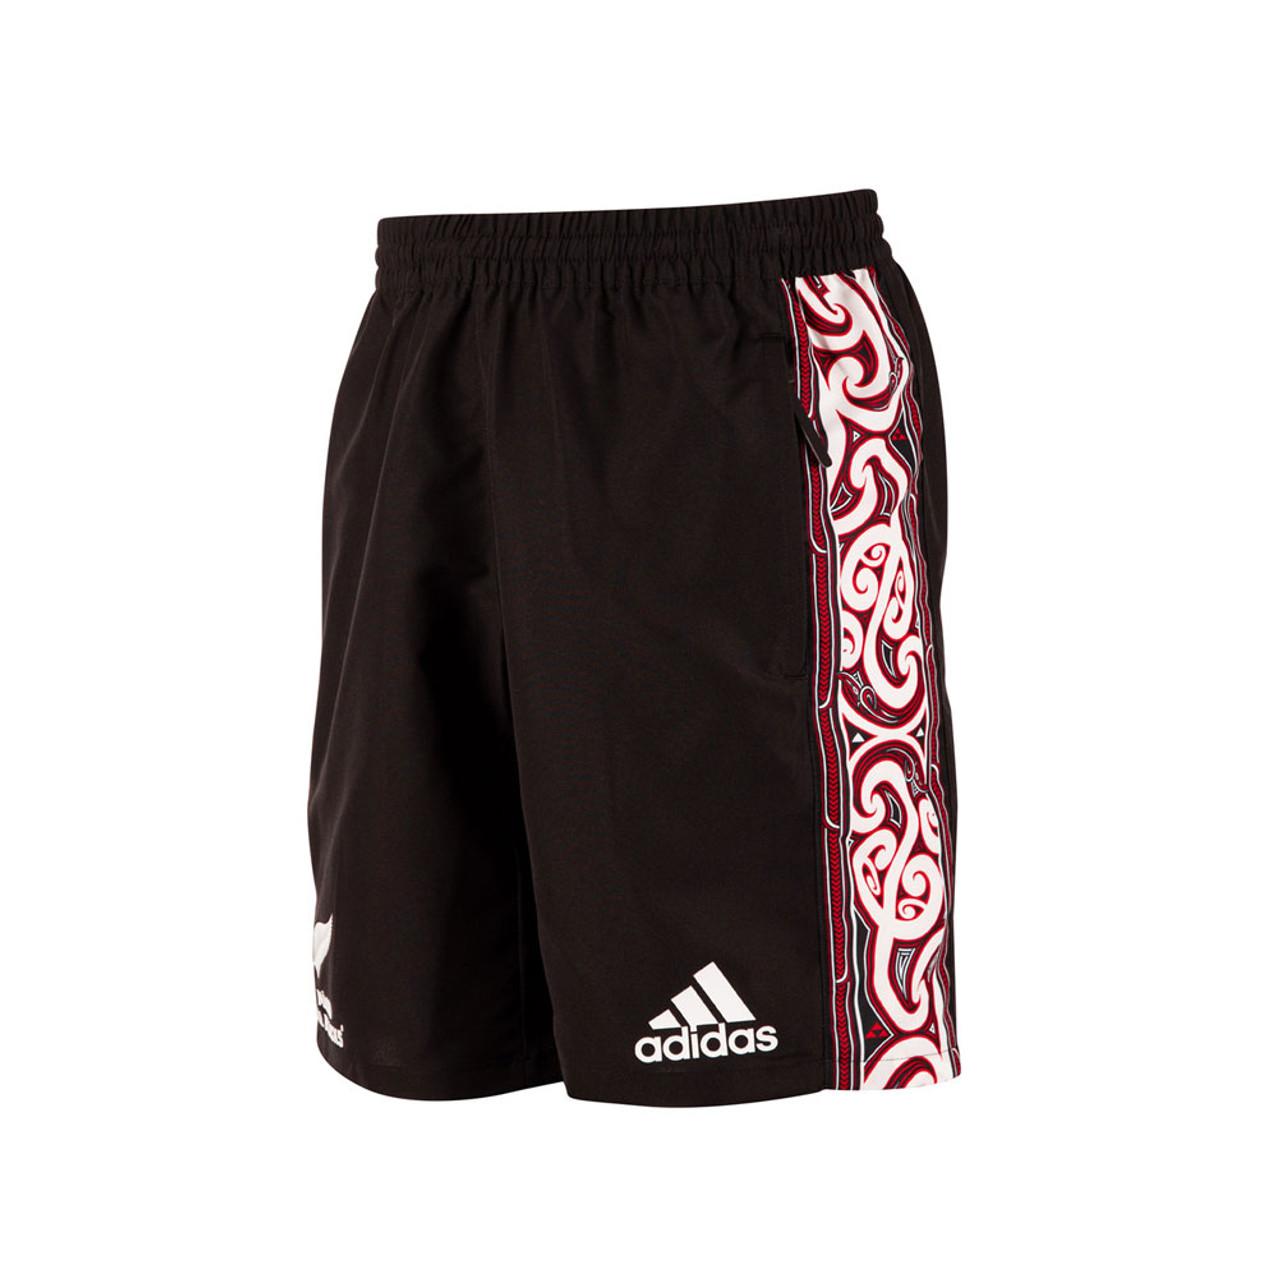 b58580a07342 ADIDAS Mens All Blacks Maori woven rugby short 2019  black